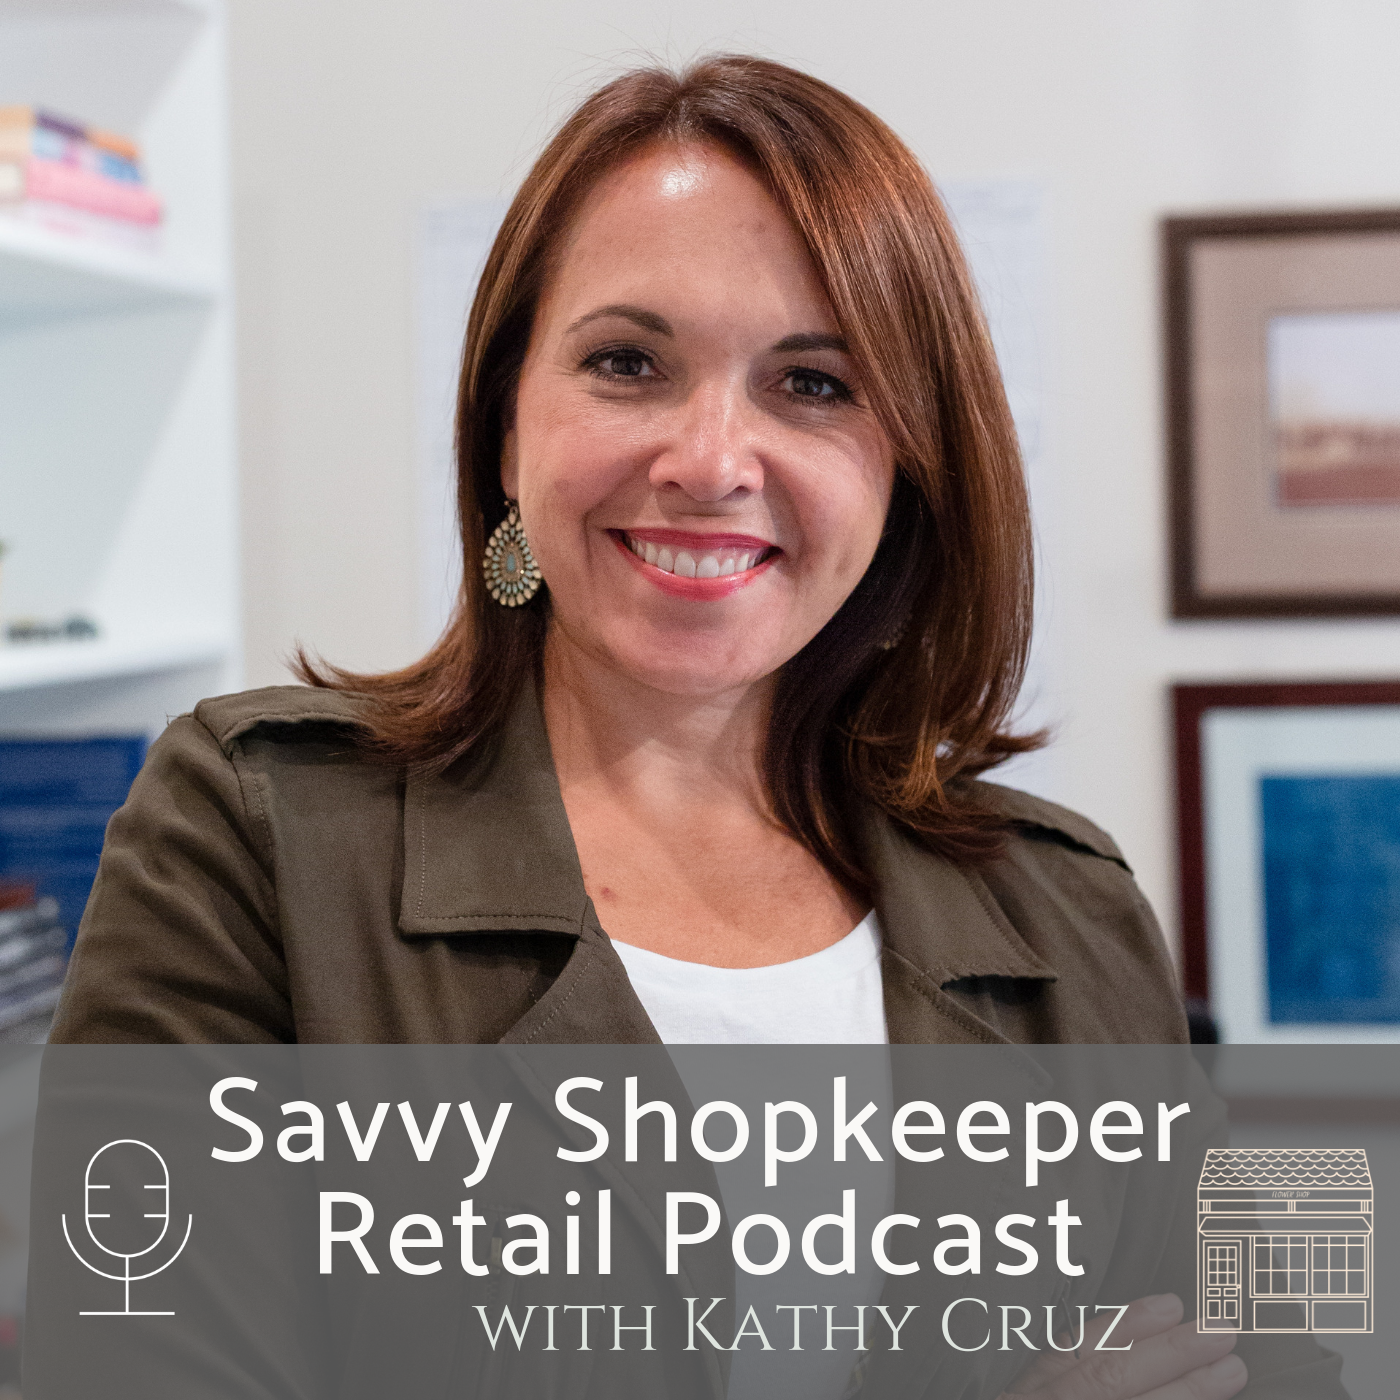 Savvy Shopkeeper Retail Podcast show art